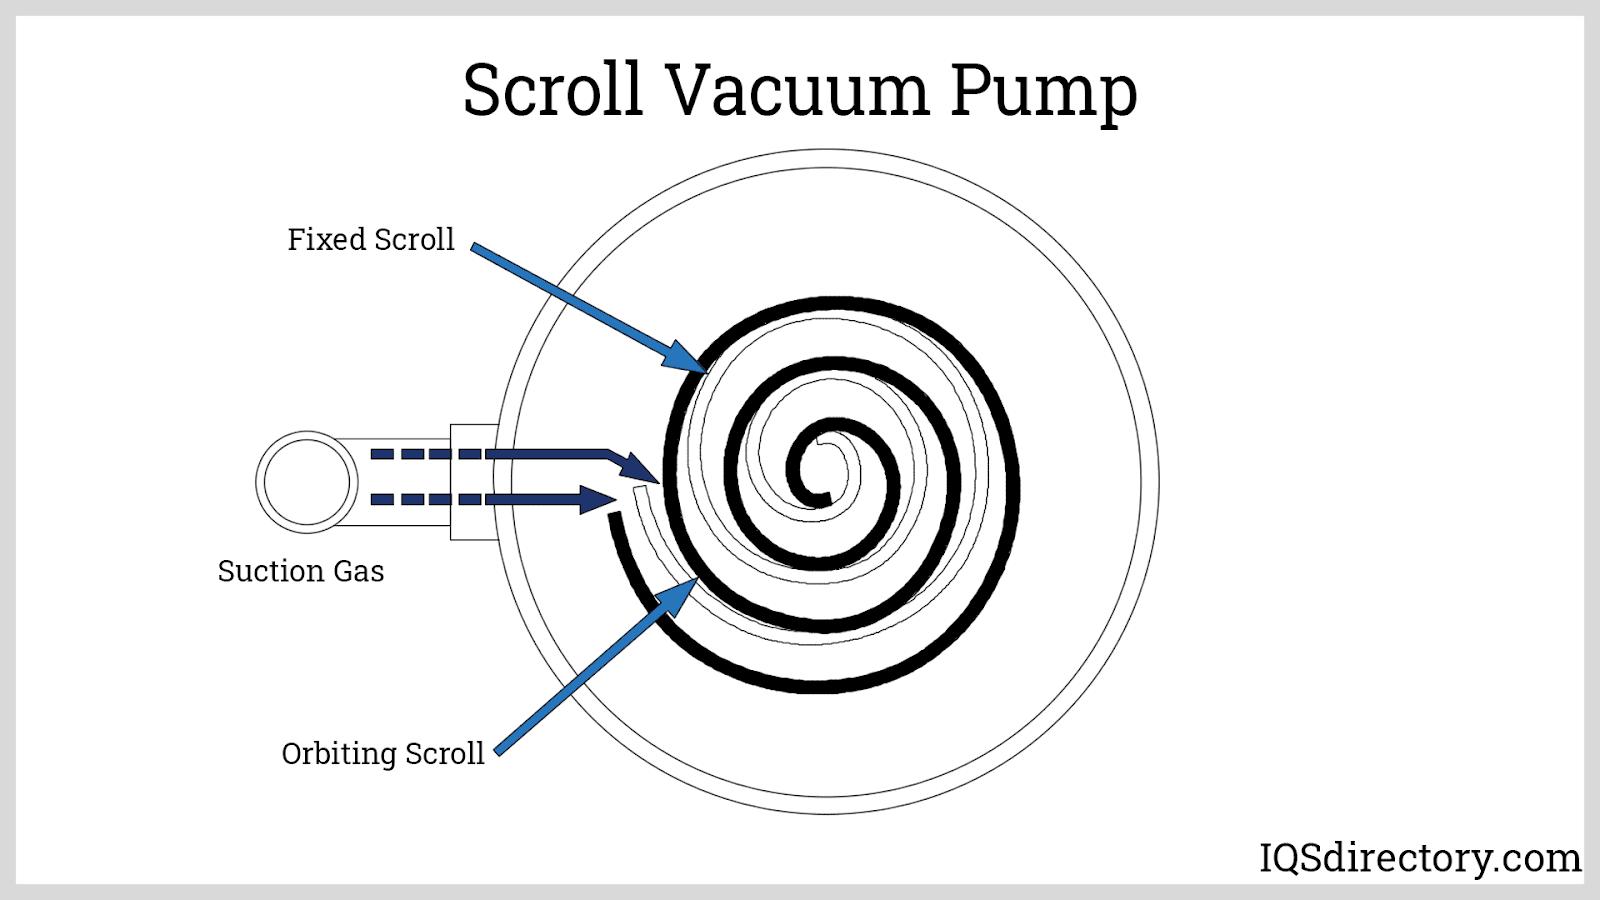 Scroll Vacuum Pump